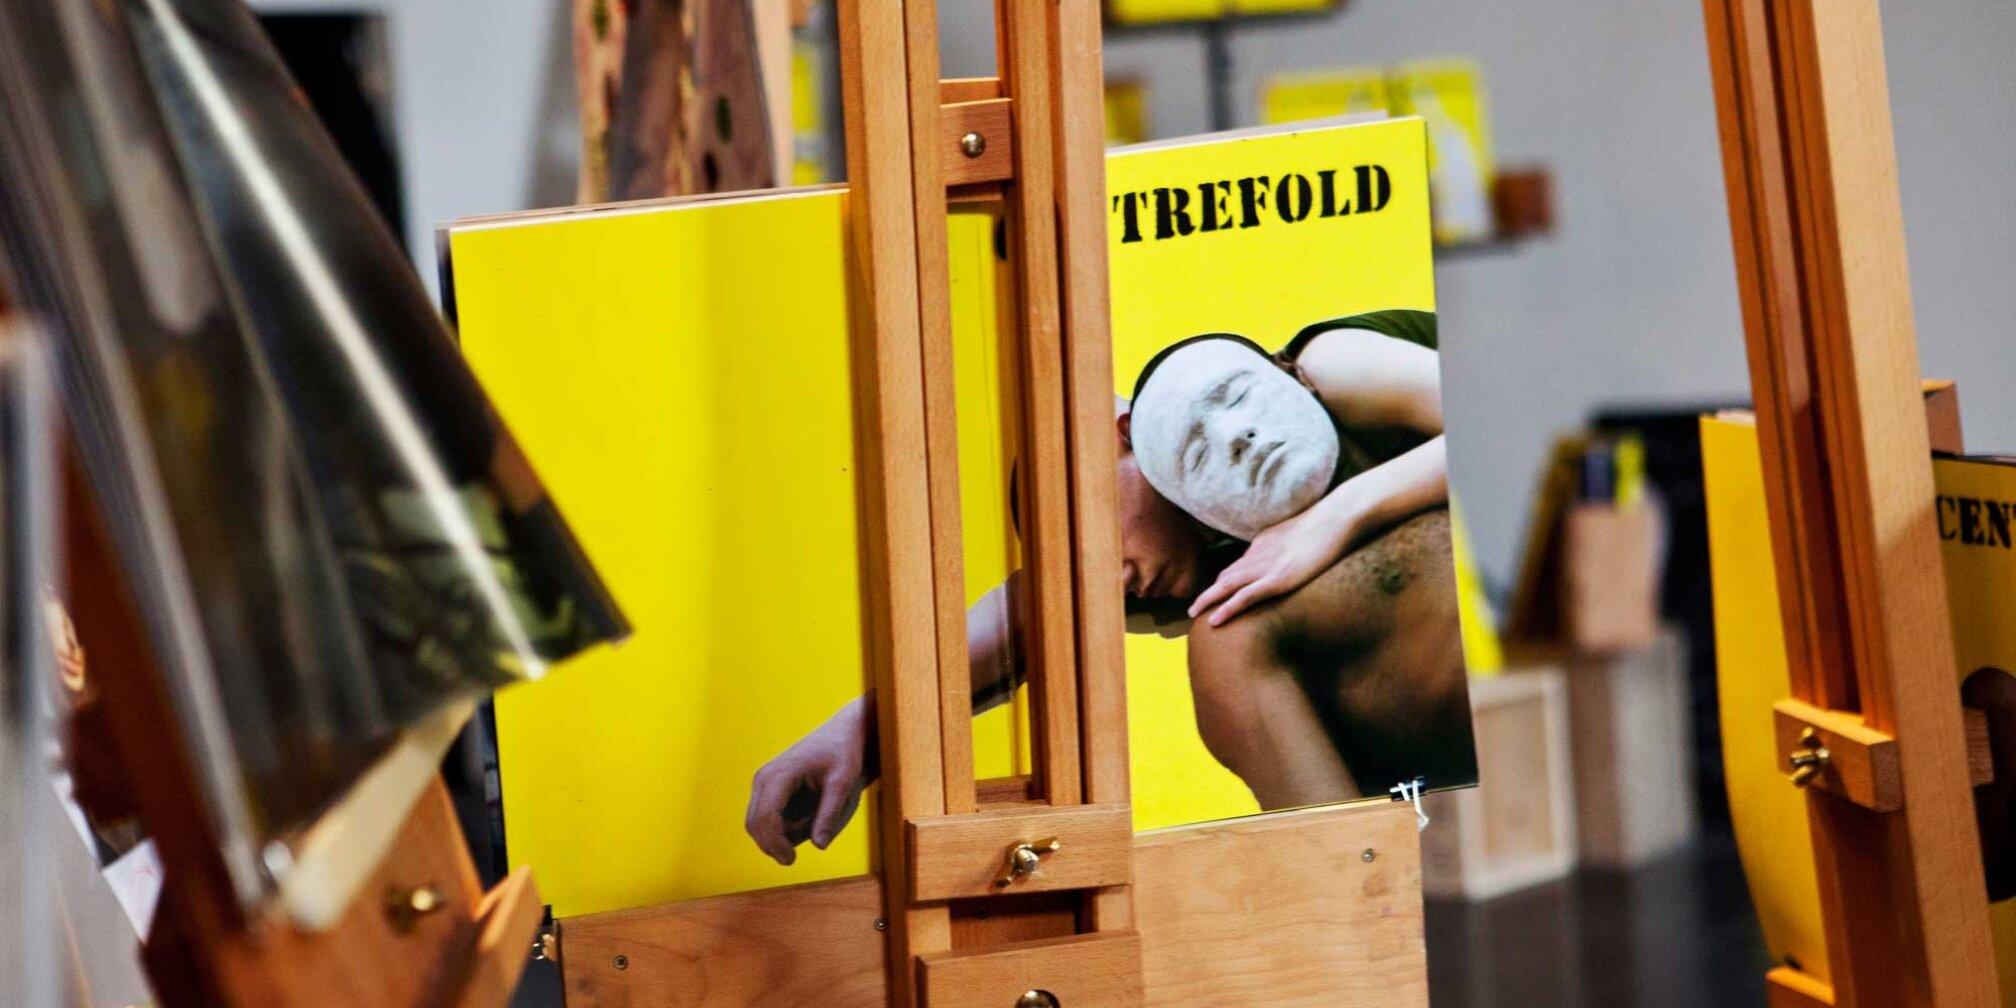 Centrefold 8: A Short History of Artists' Books